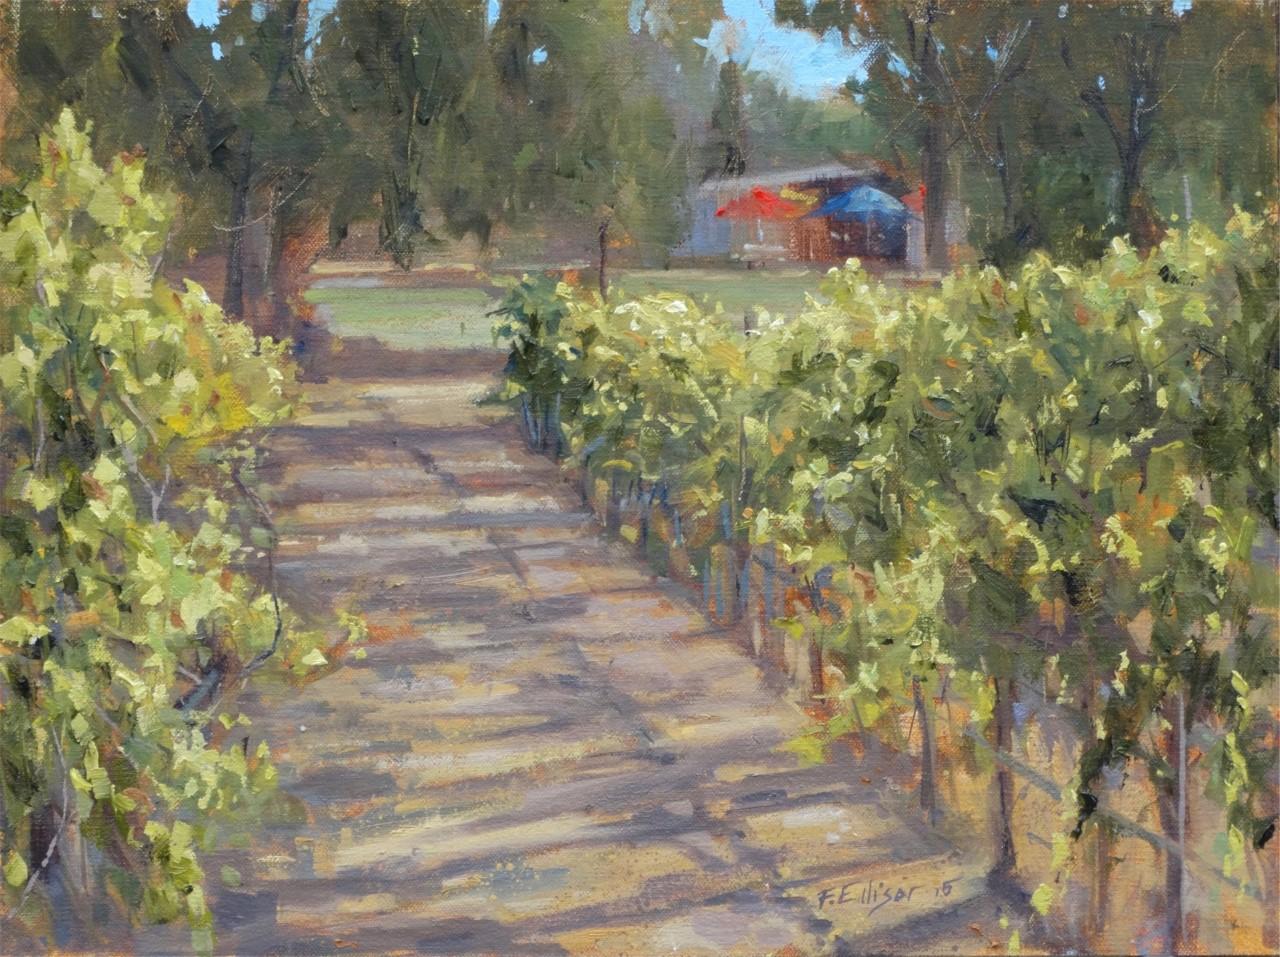 Fran Ellisor - Morning Walk in the Vinyard